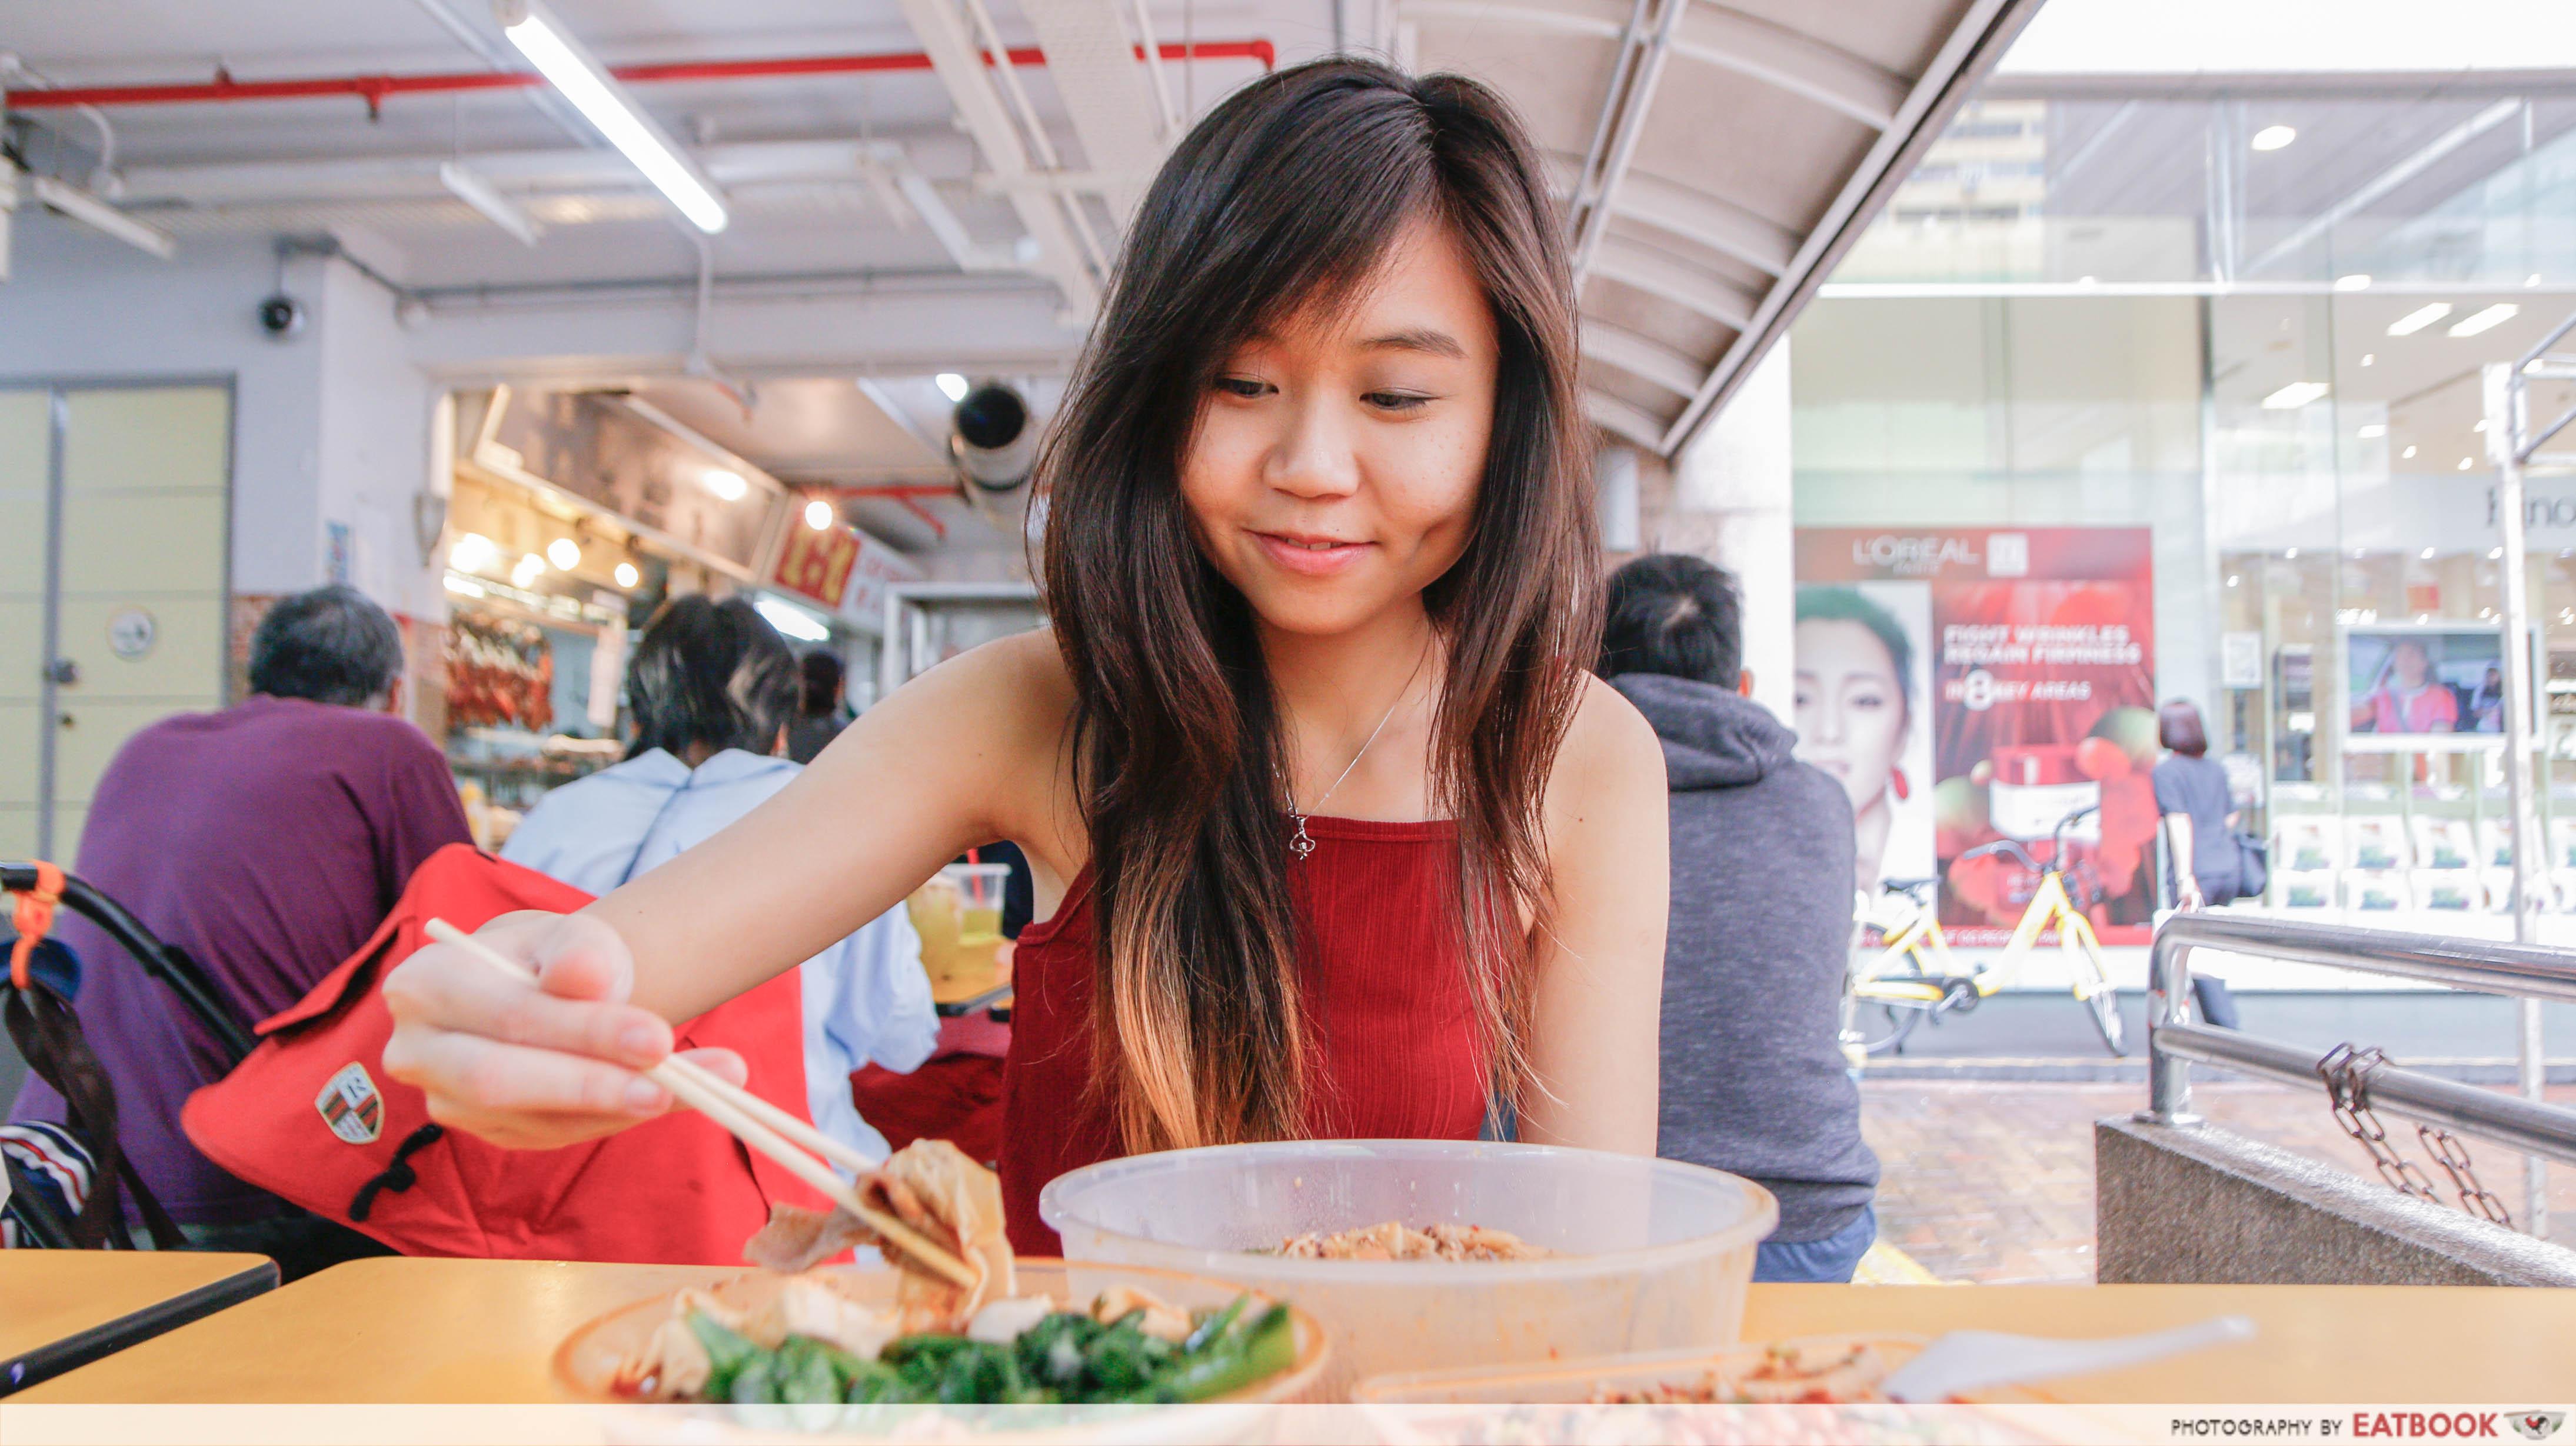 old chengdu - me